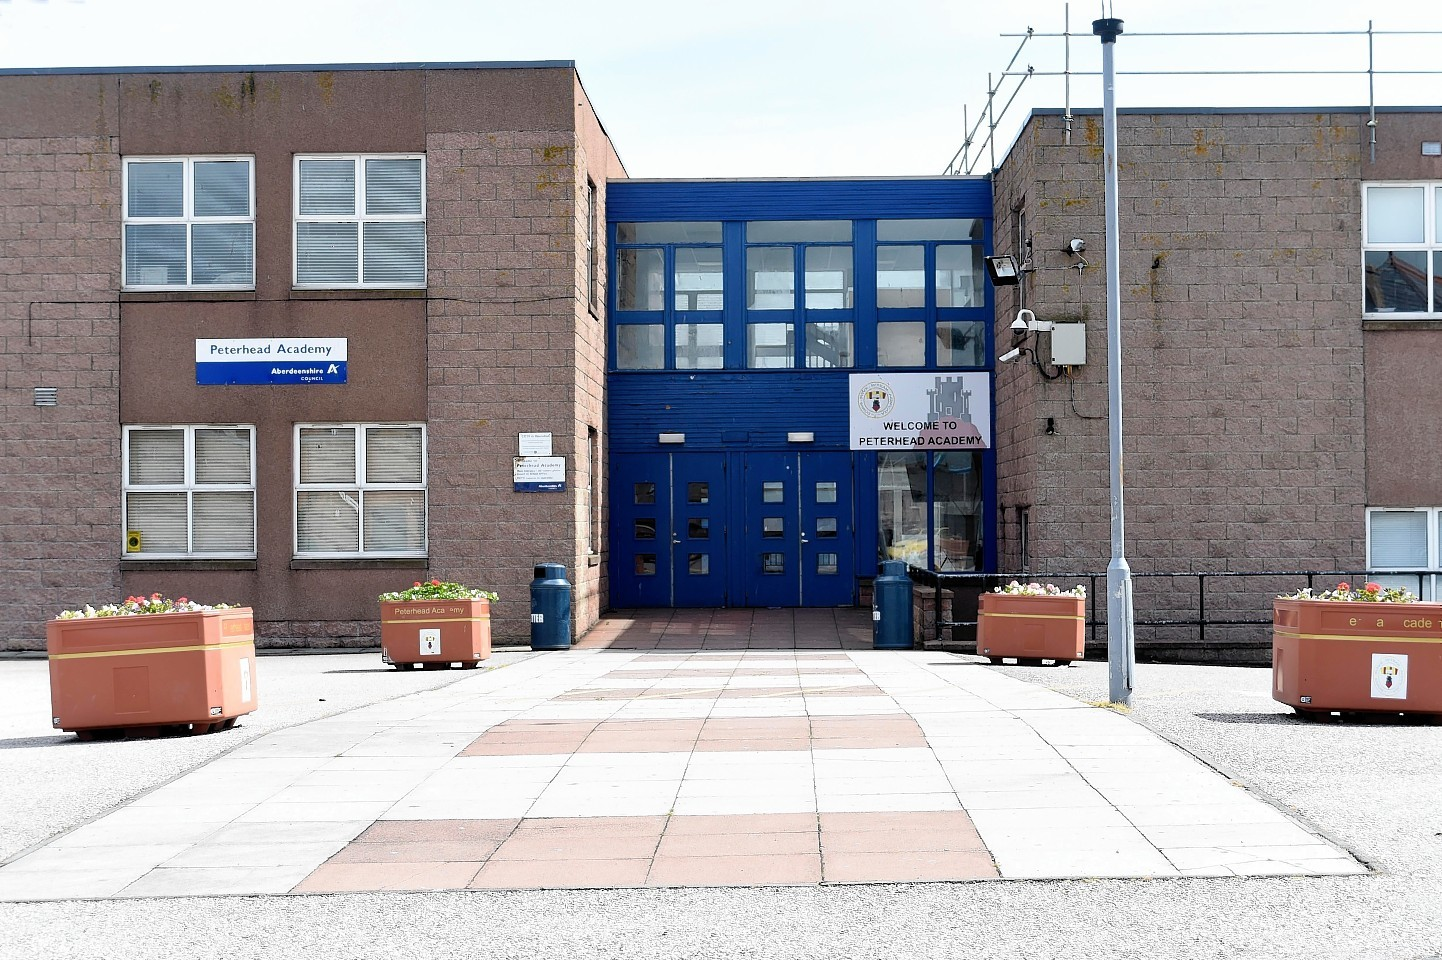 Peterhead Academy.